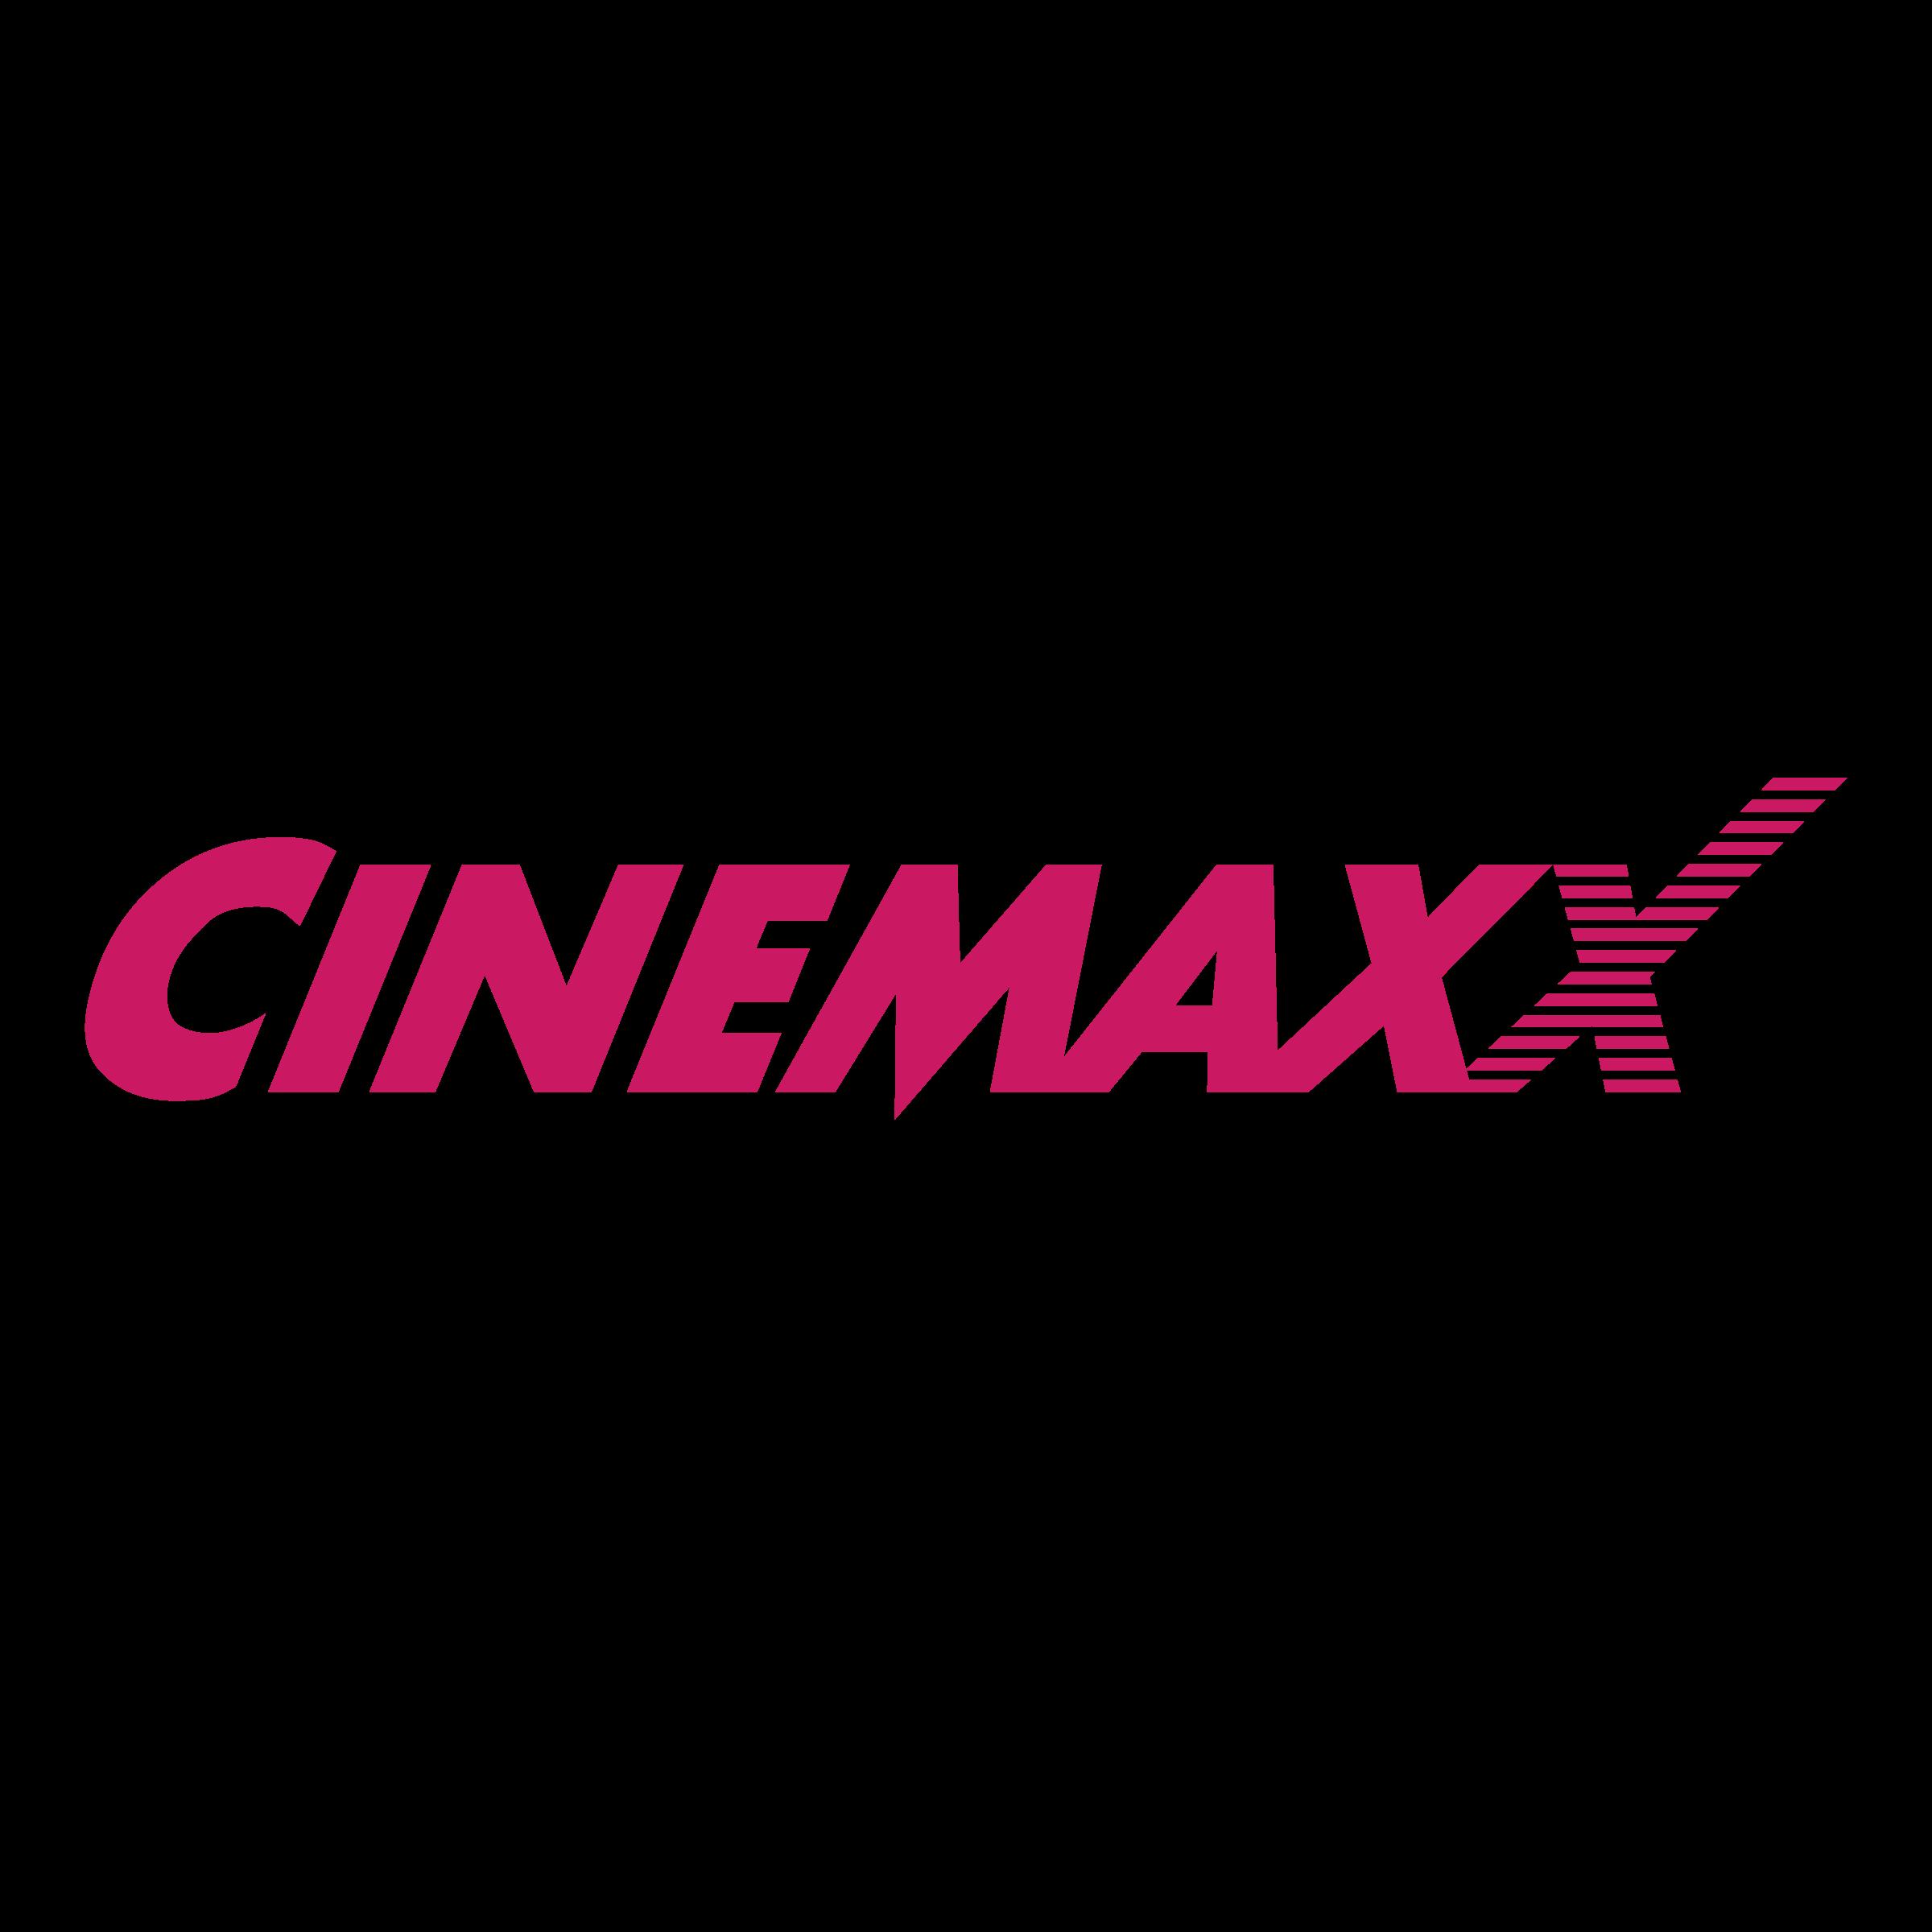 Cinemaxx logo png transparent svg vector freebie supply cinemaxx logo png transparent stopboris Choice Image